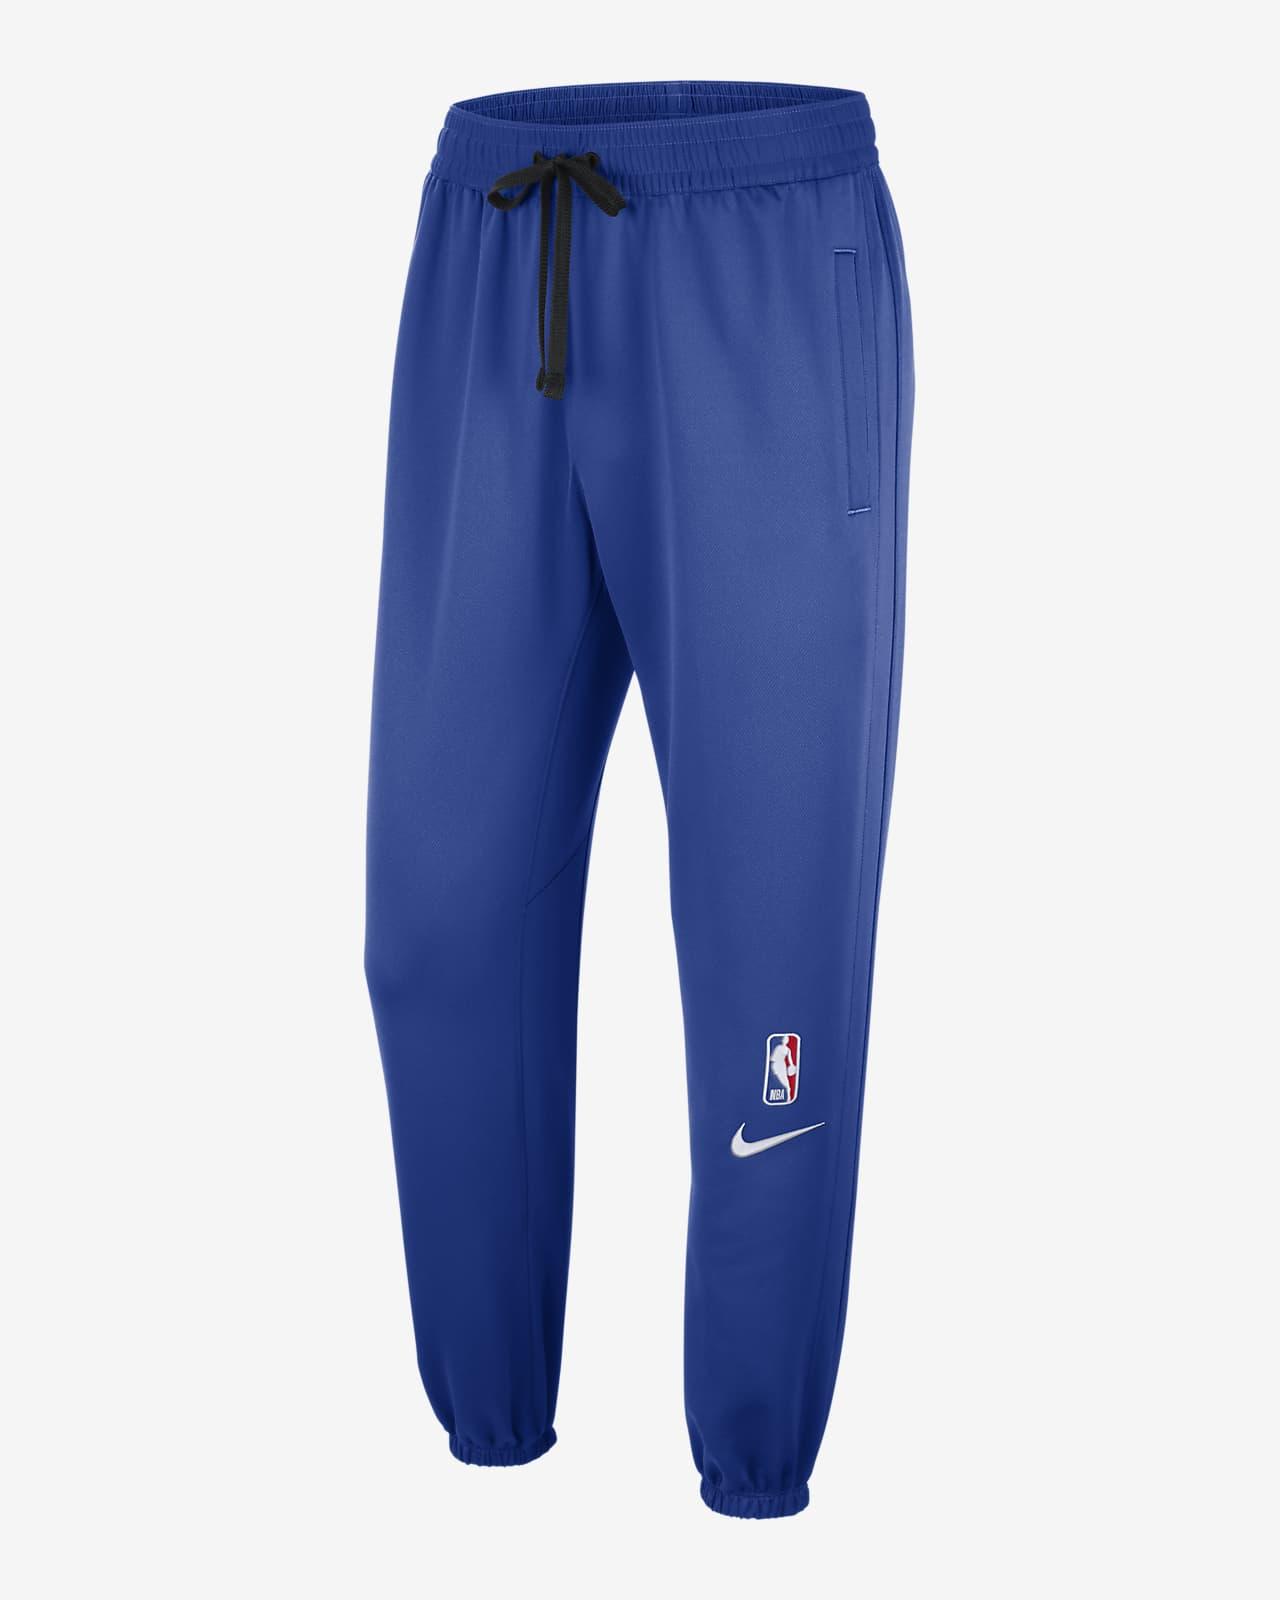 Pantalon NBA Nike Therma Flex Golden State Warriors Showtime pour Homme